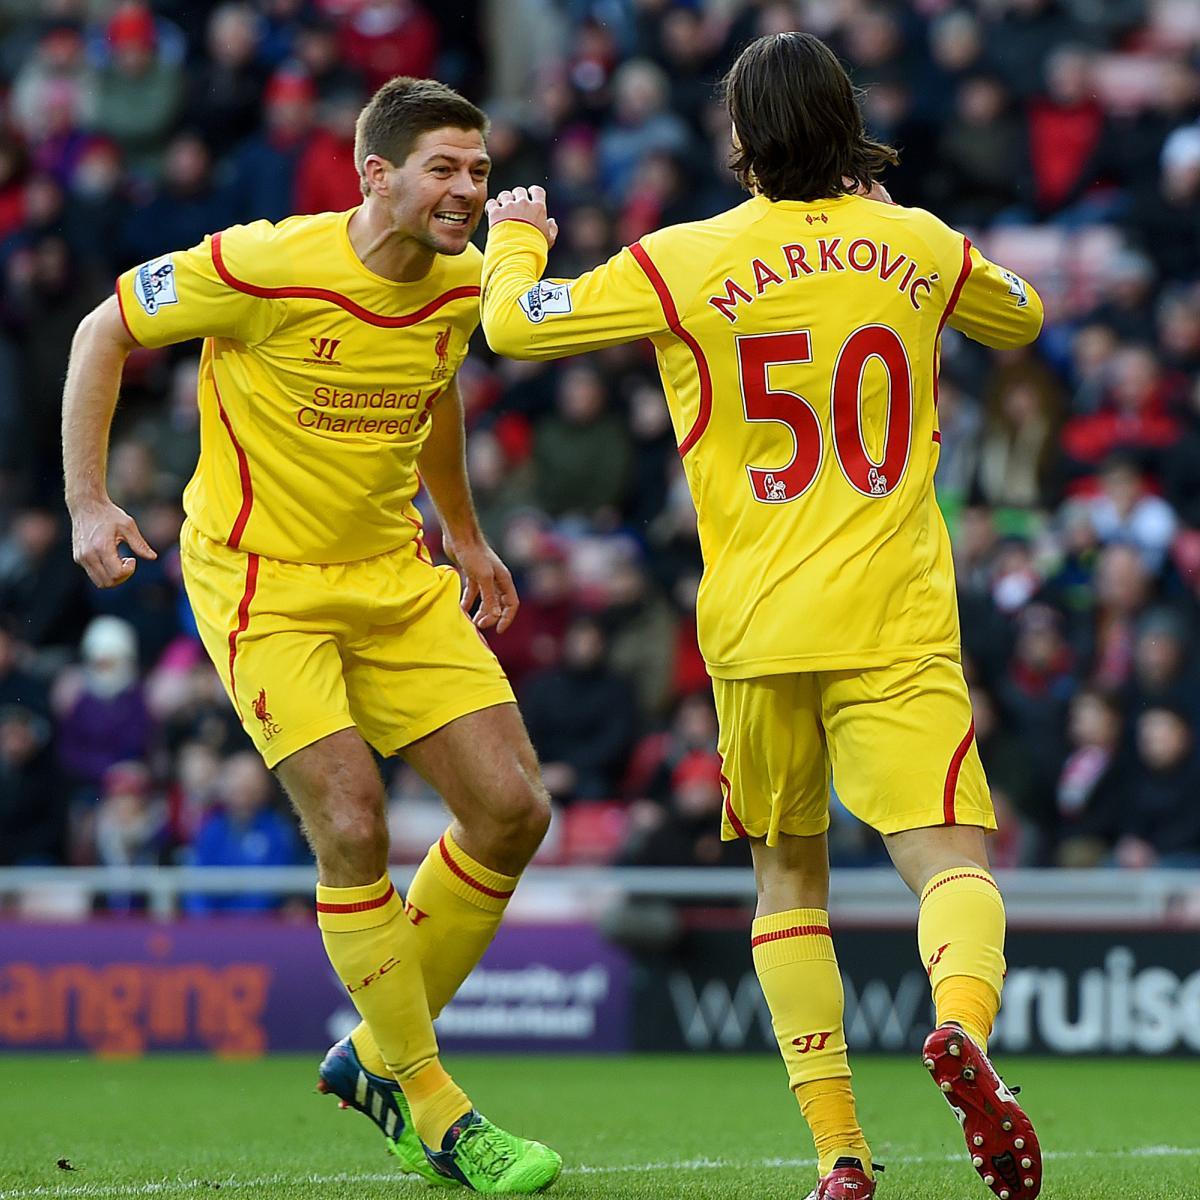 Sunderland Vs. Liverpool: Live Score, Highlights From